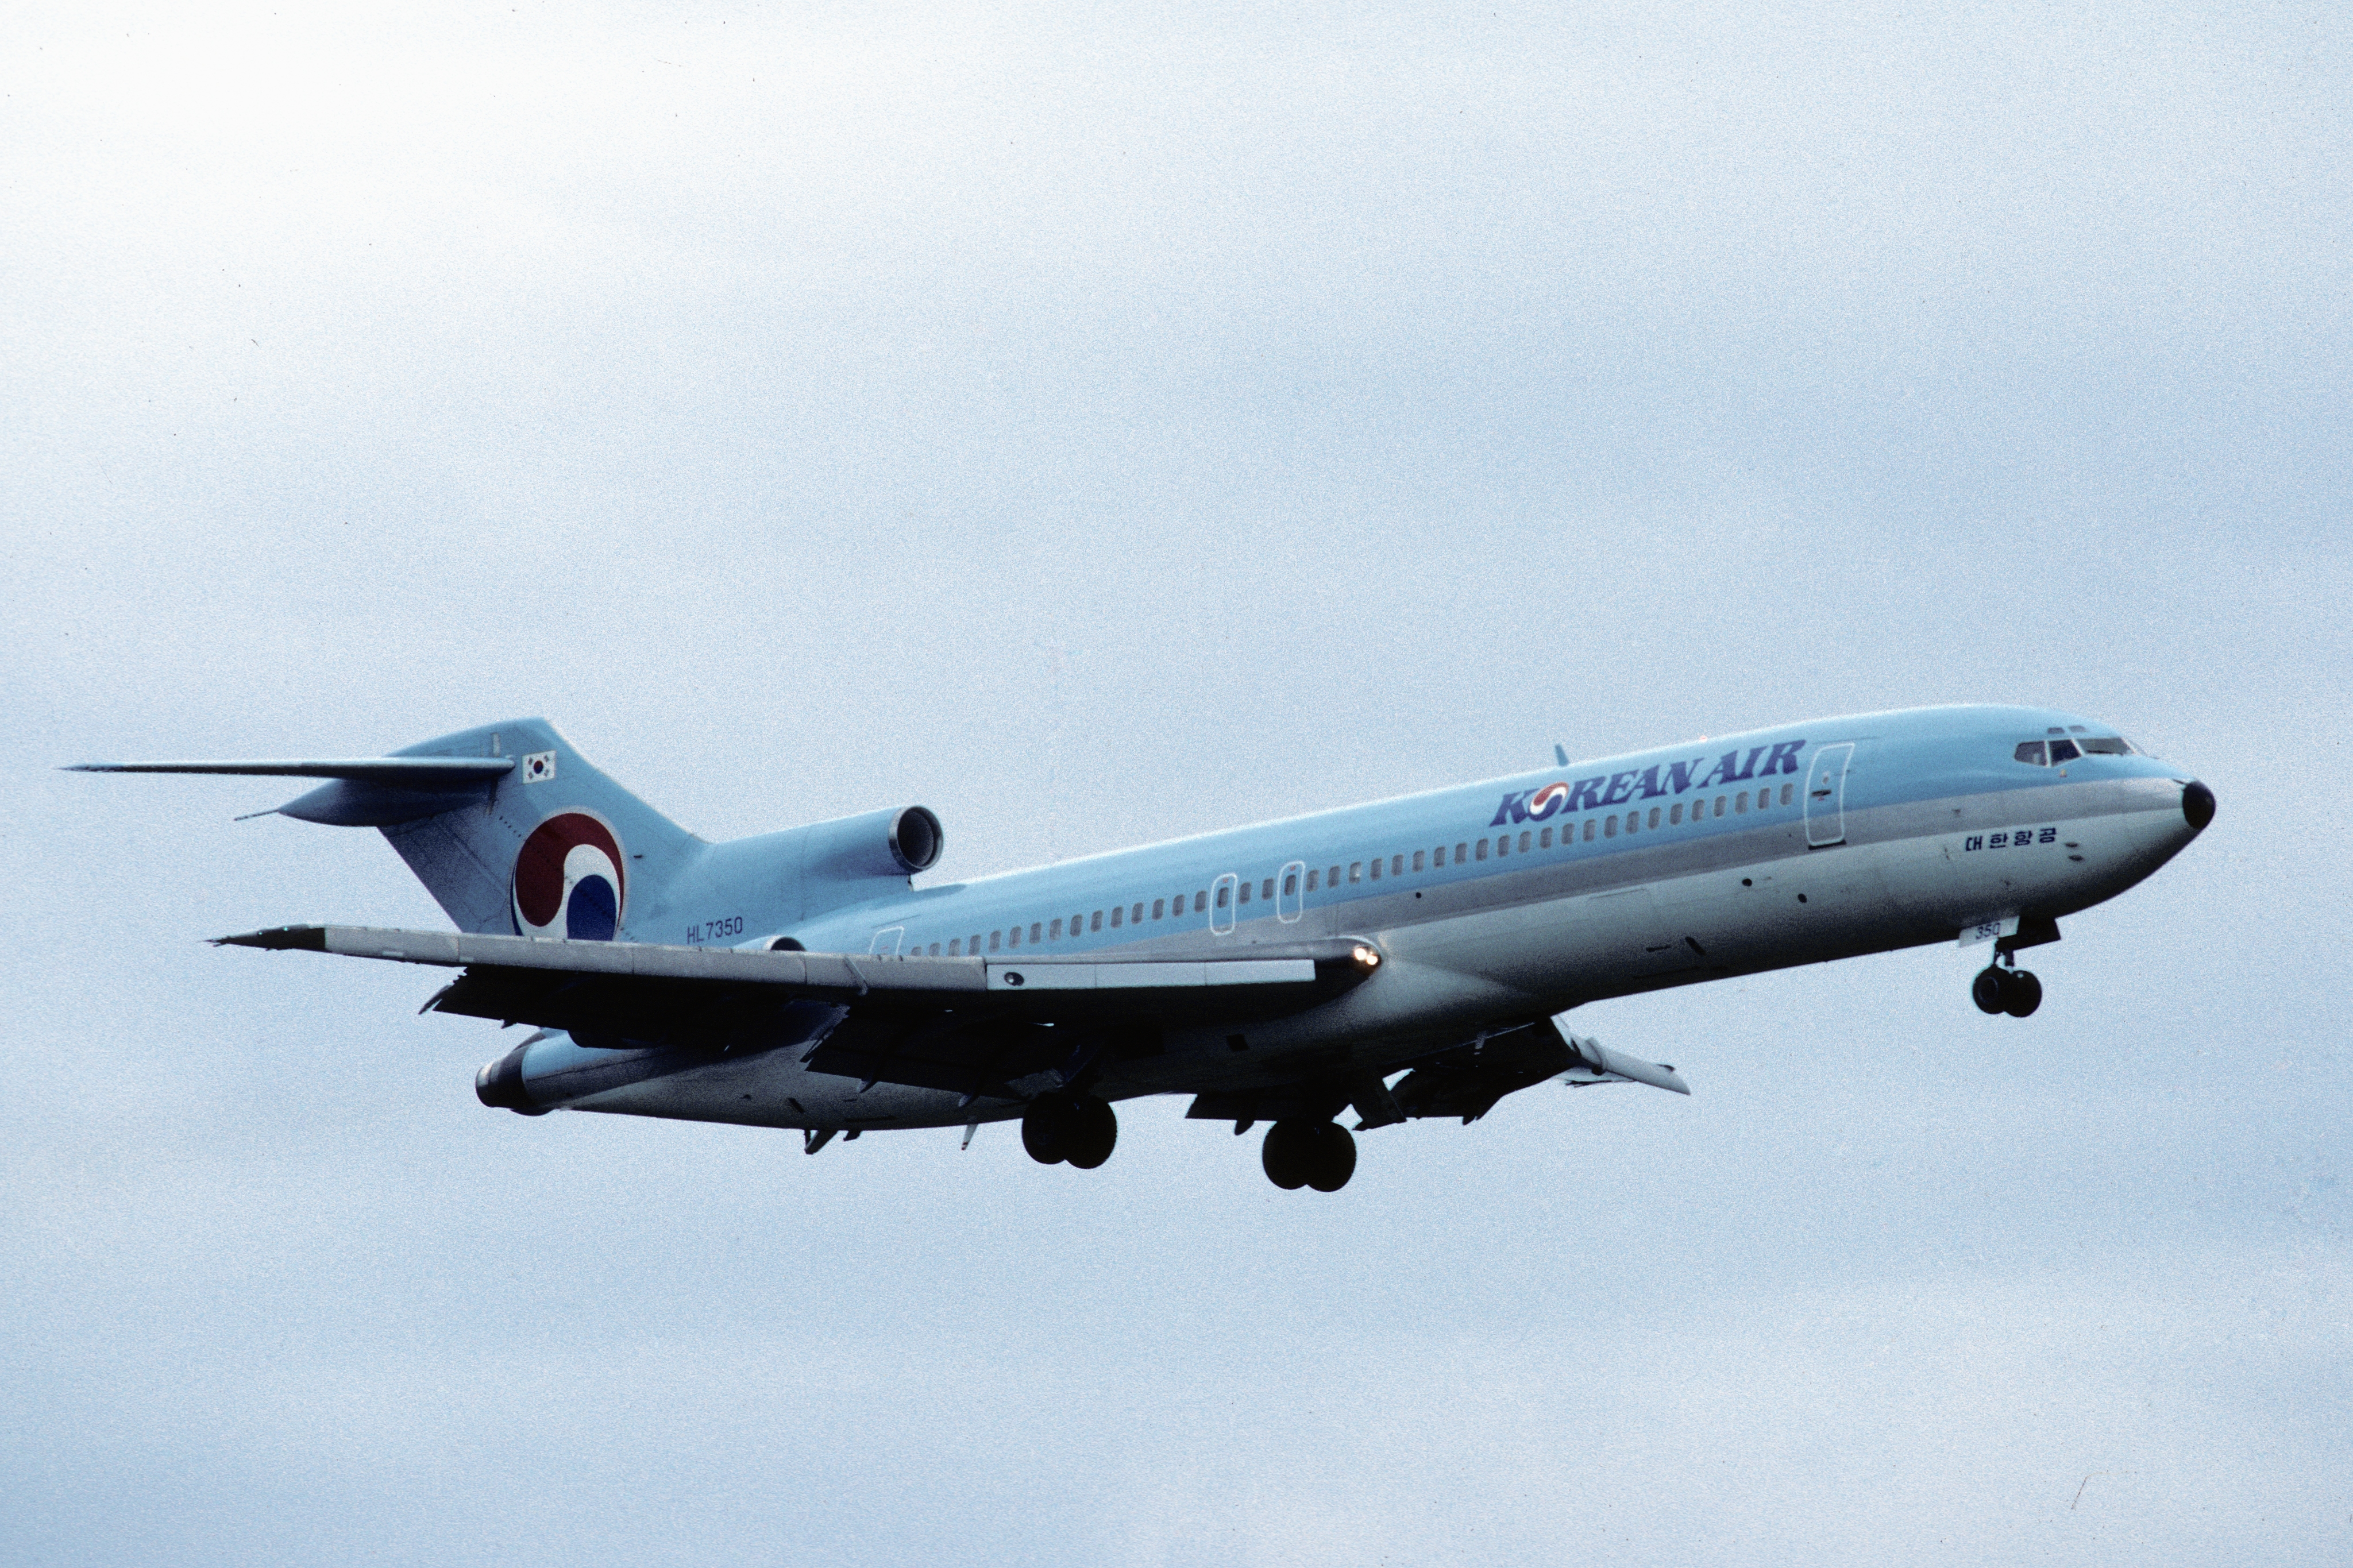 File:Korean Air Boeing 727-281 (HL7350-852-20469).jpg